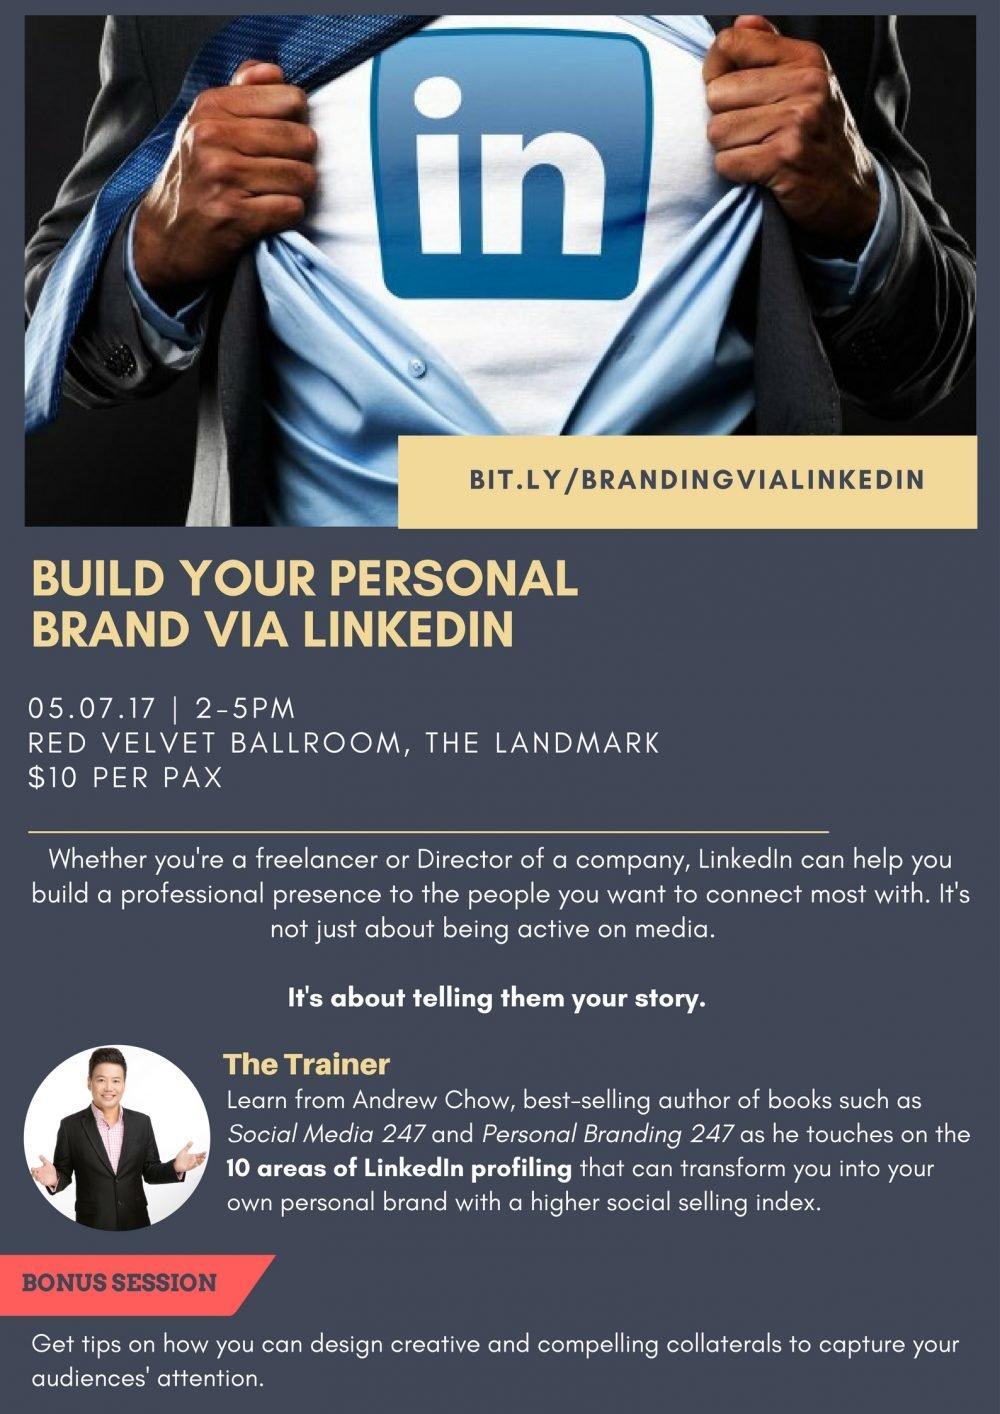 Build Your Personal Brand via LinkedIn